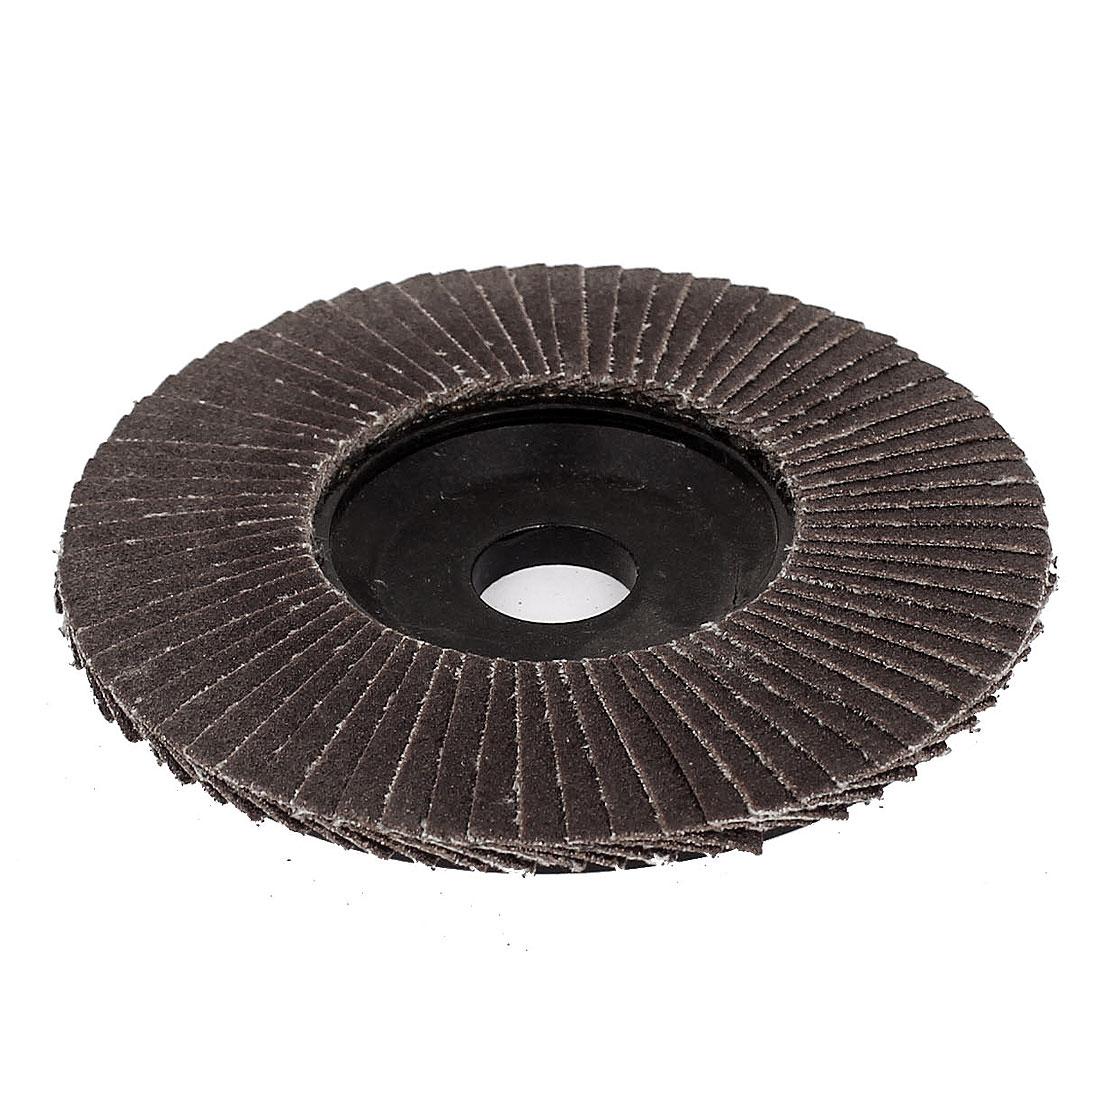 100mm Dia 16mm Hole Angle Grinder Flap Sanding Disc Grinding Wheel 120 Grit